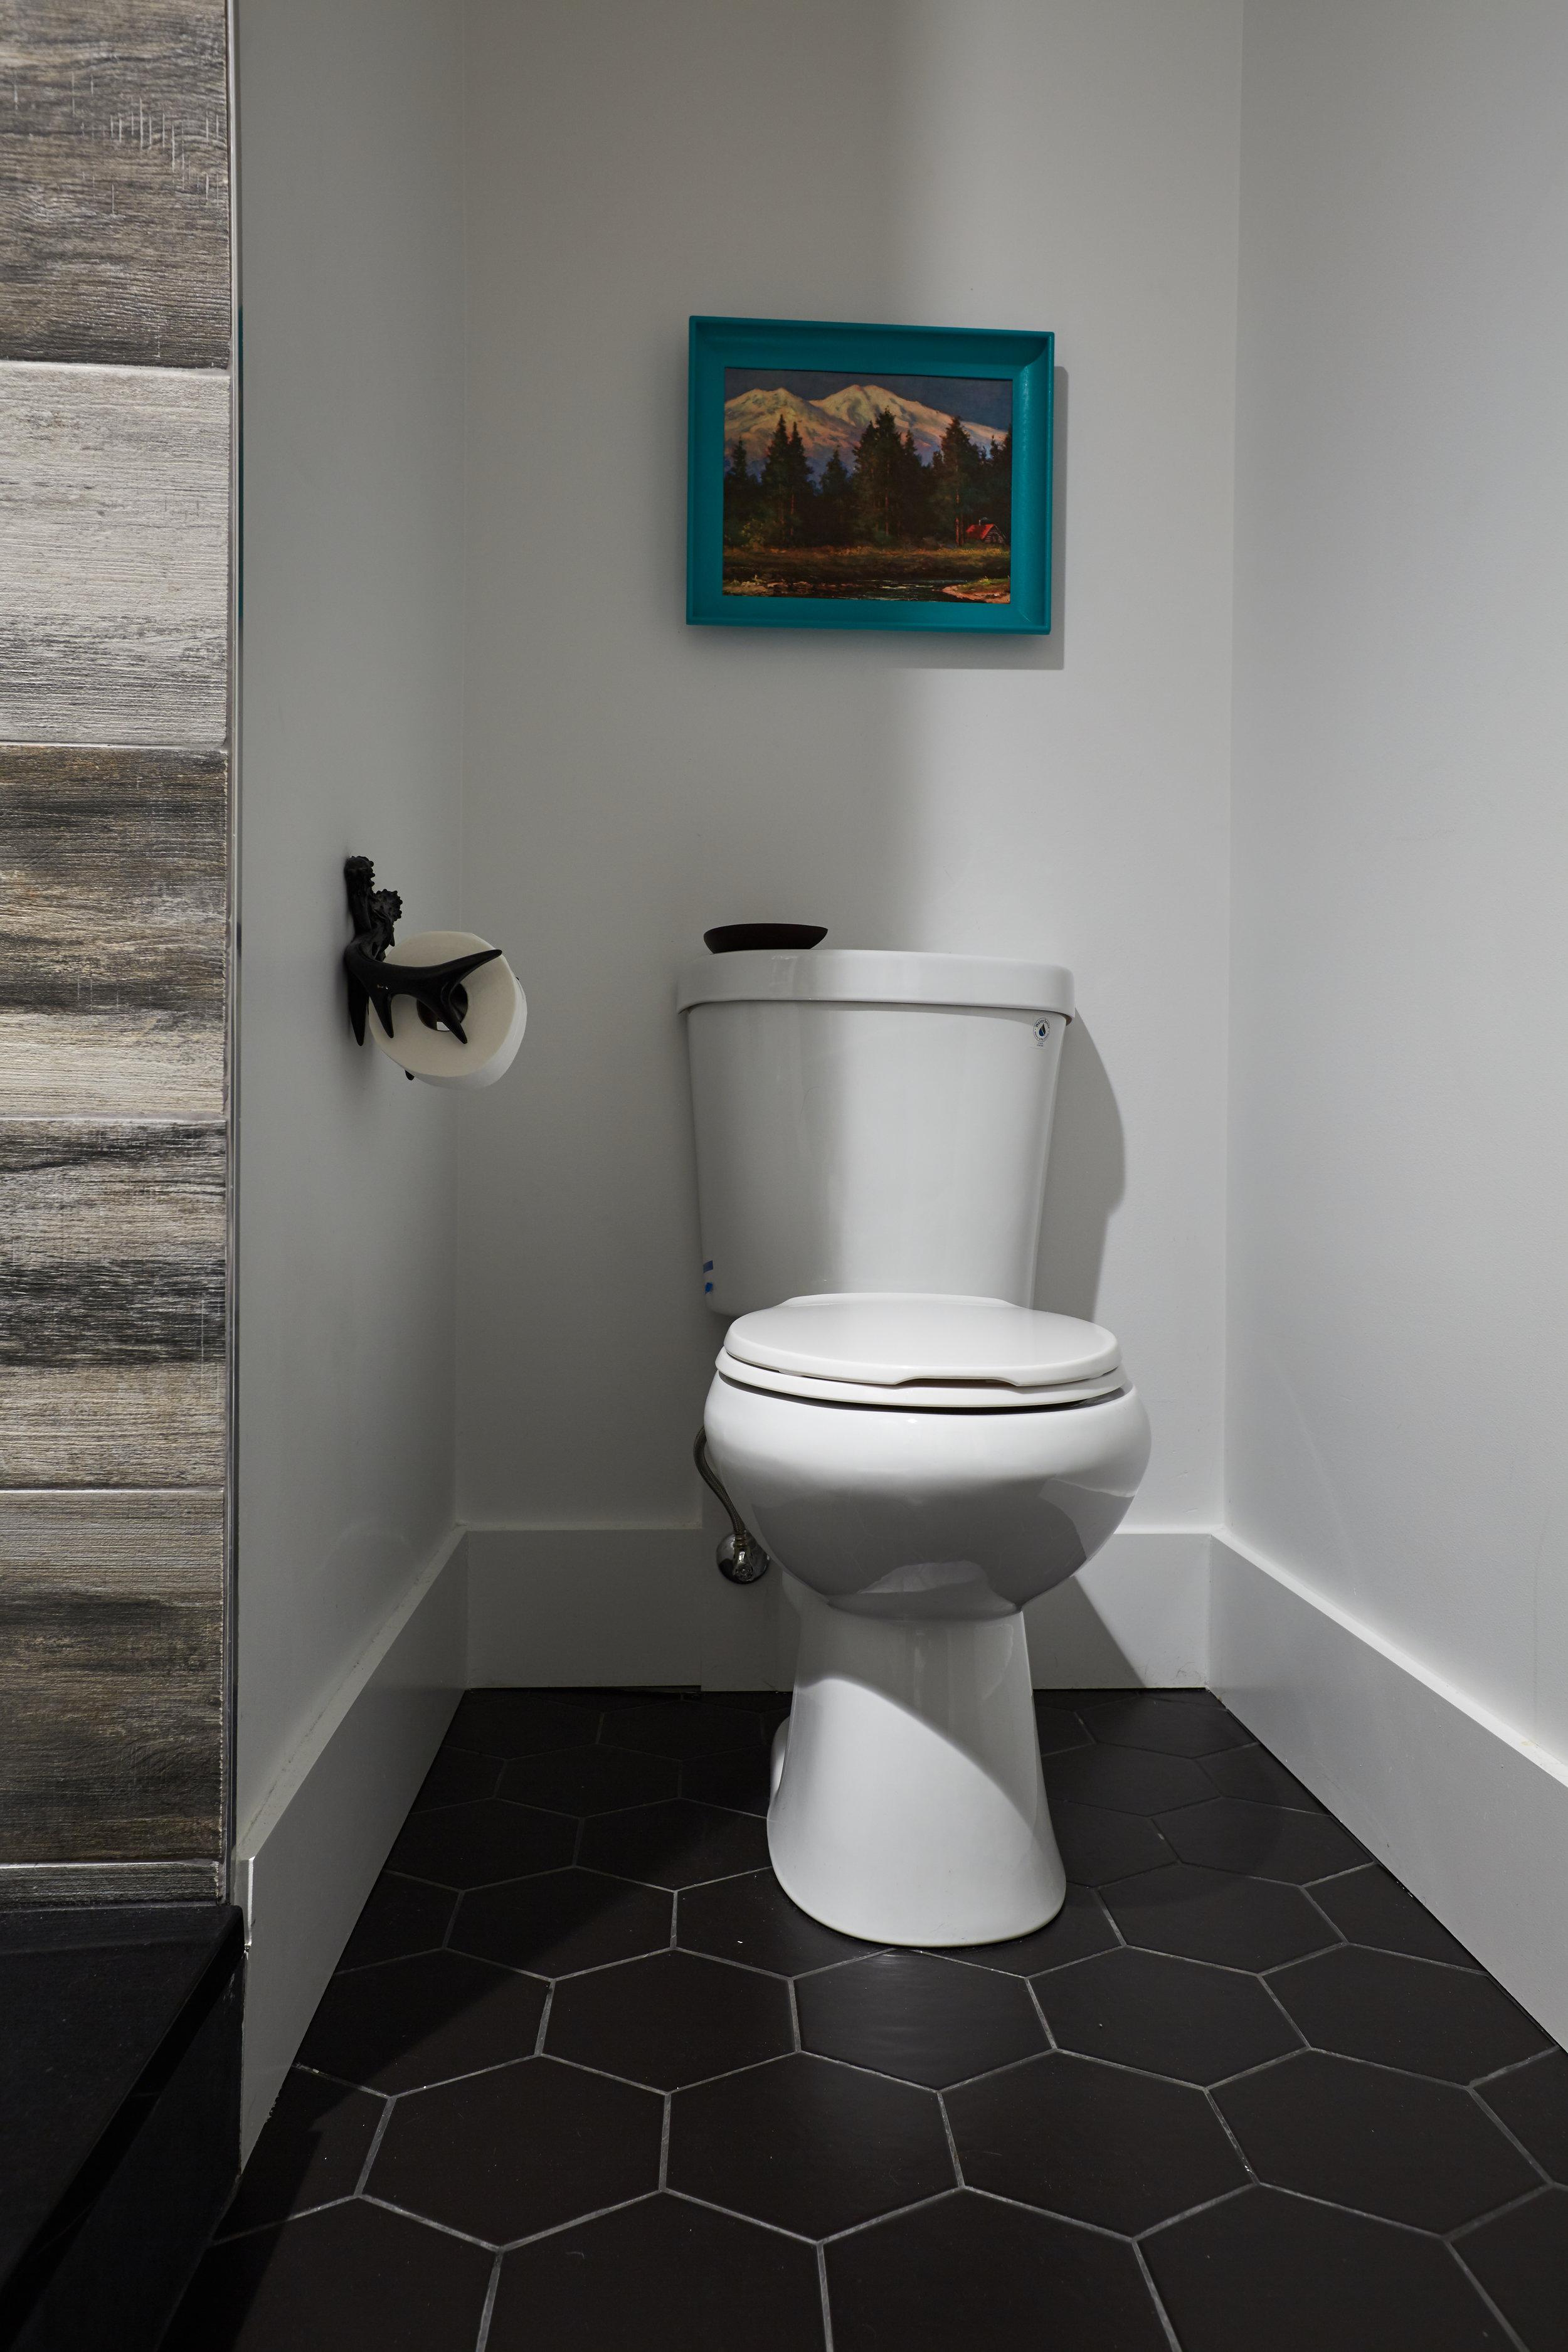 El_Motel_Bathroom_902.jpg